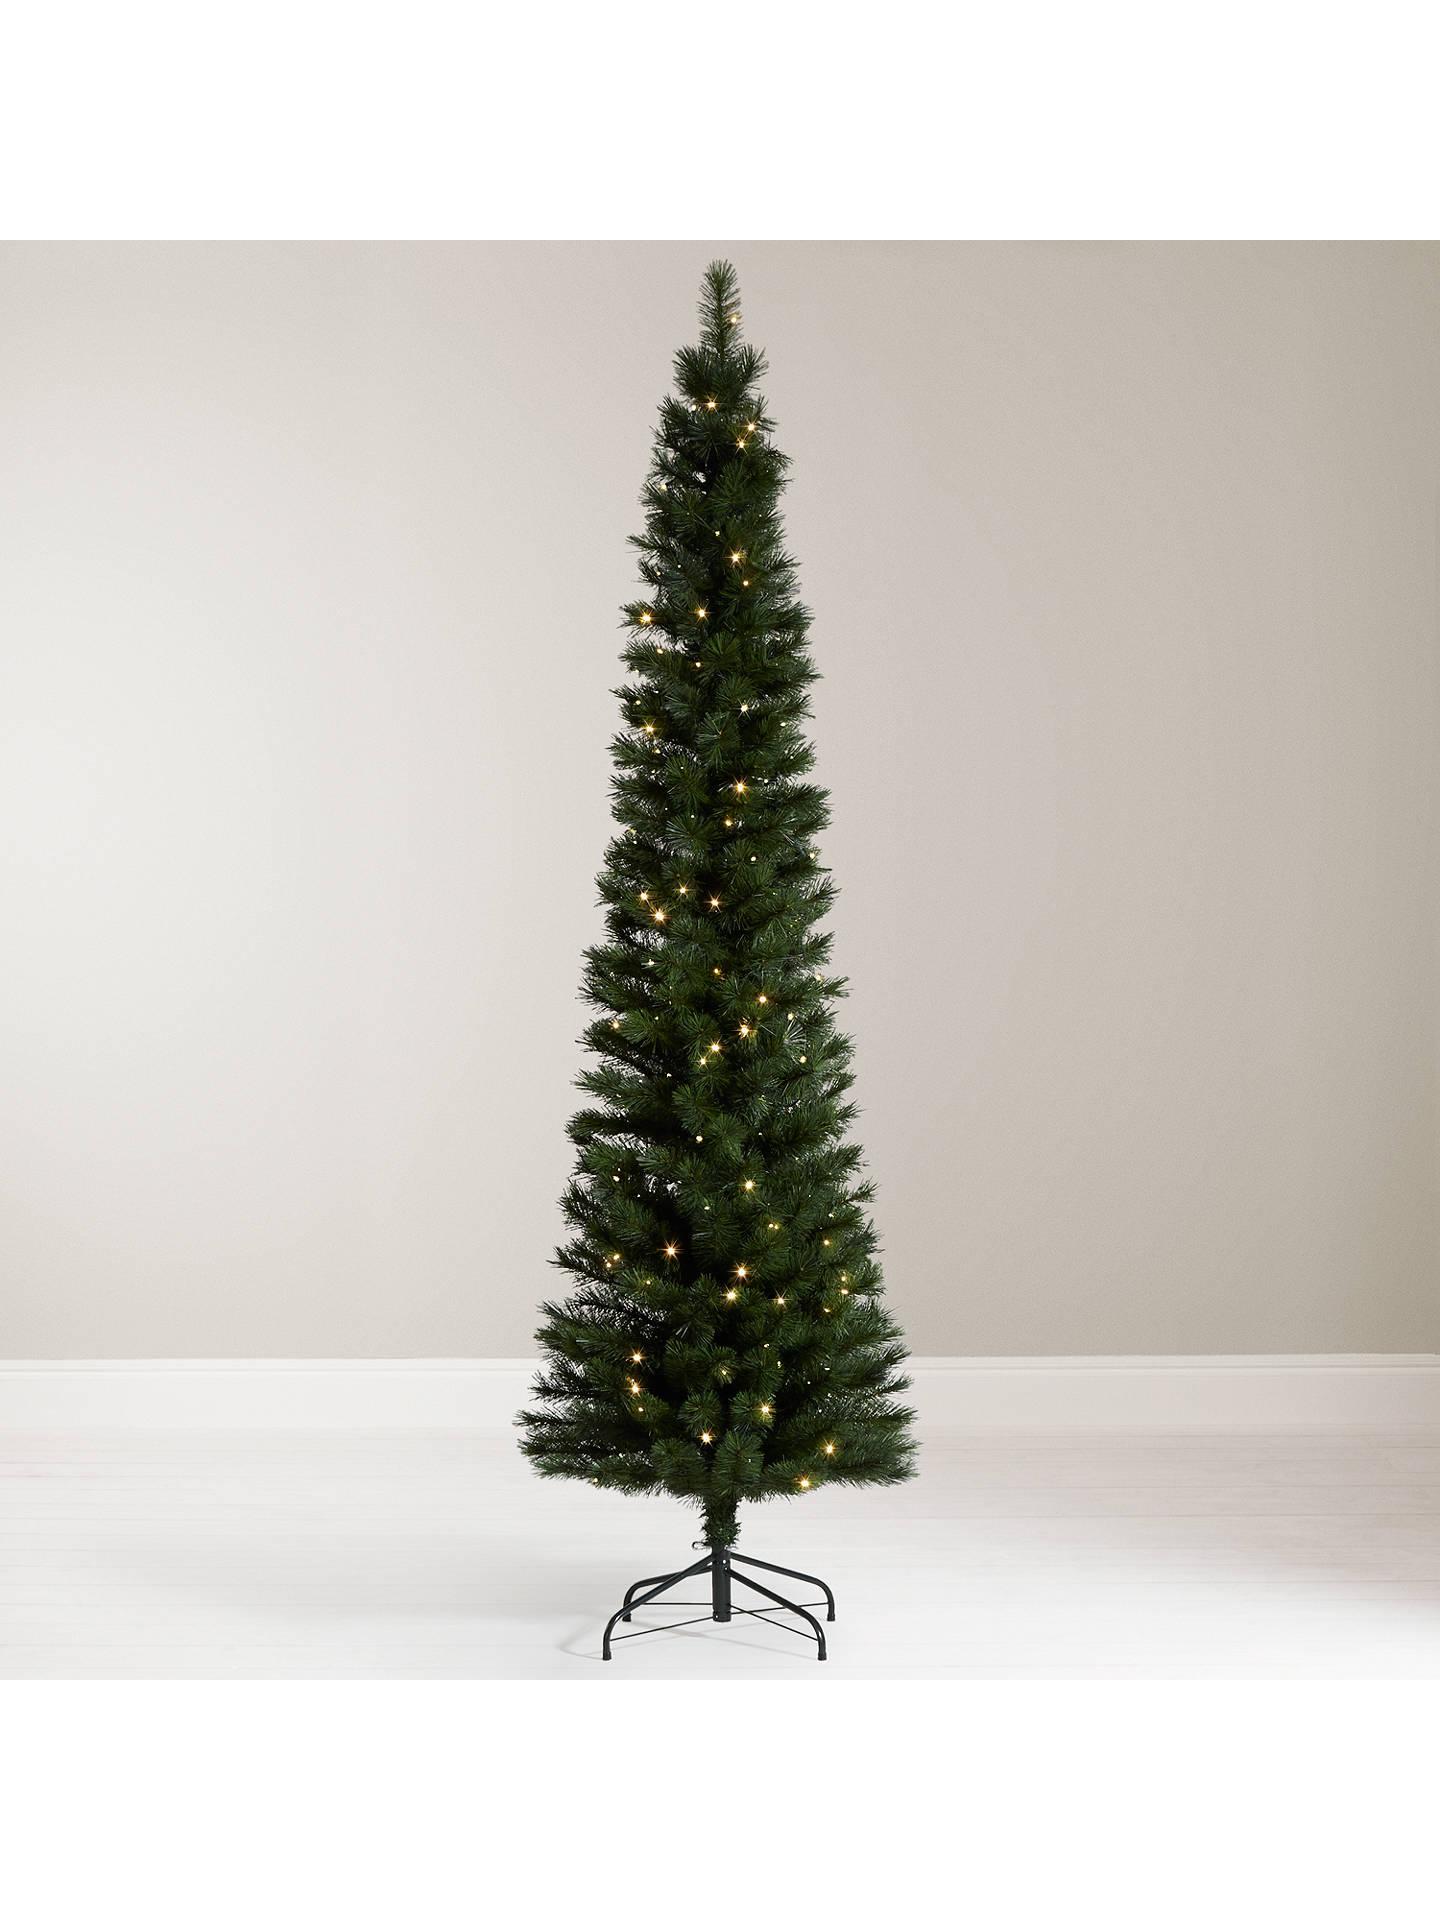 7 Ft Christmas Tree Prelit.John Lewis Pre Lit Pencil Pine Christmas Tree 7ft At John